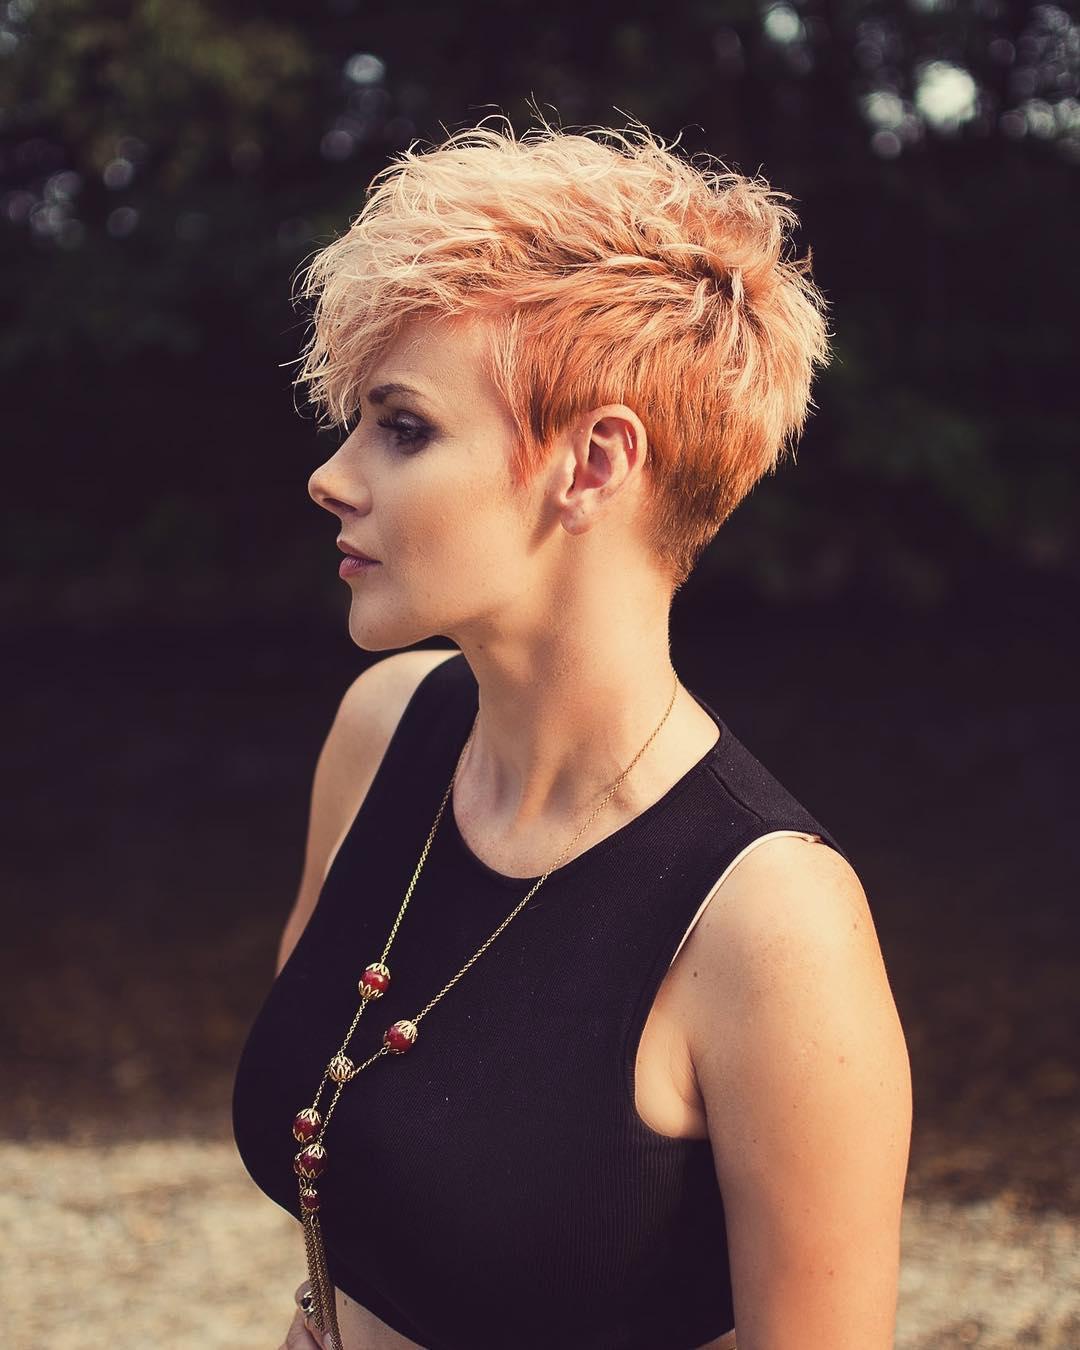 stylish-pixie-cut-designs-women-short-hairstyles-for-summer